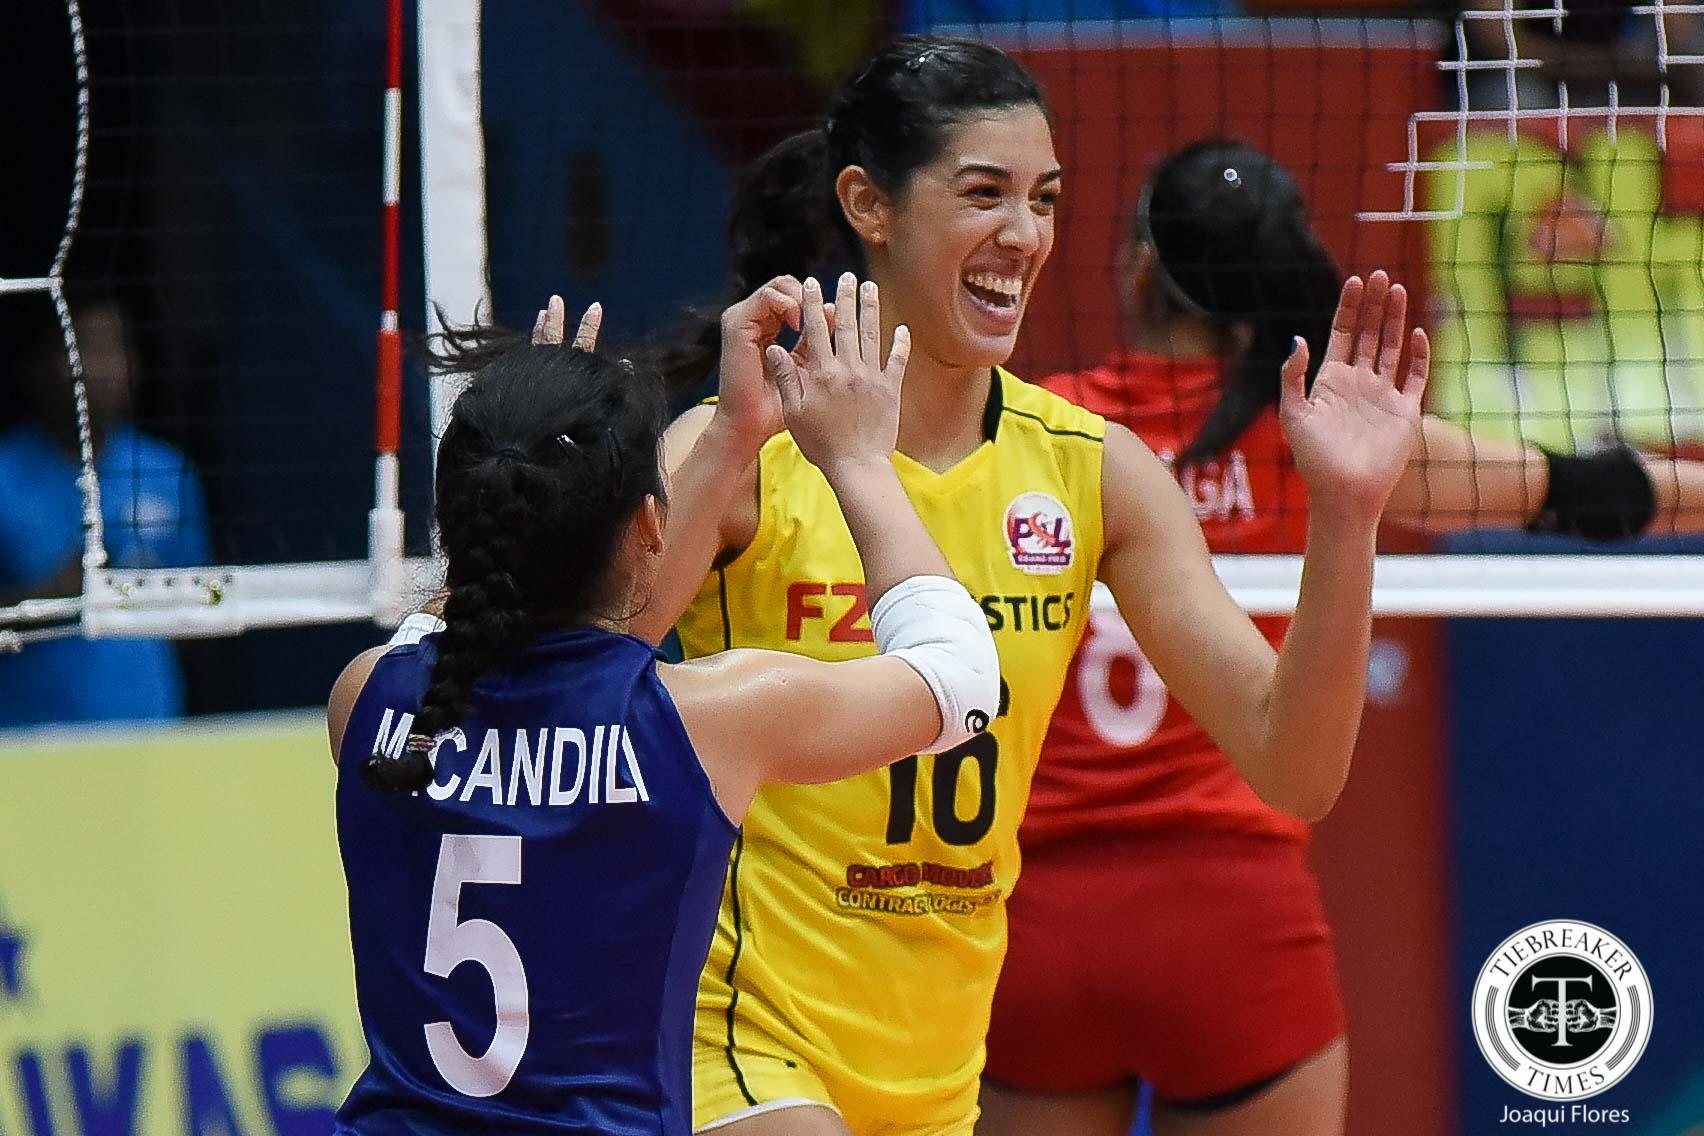 PSL-GP-2017-F2-vs.-Cignal-Perez-8281 Ramil de Jesus finally notches elusive Grand Prix title News PSL Volleyball  - philippine sports news